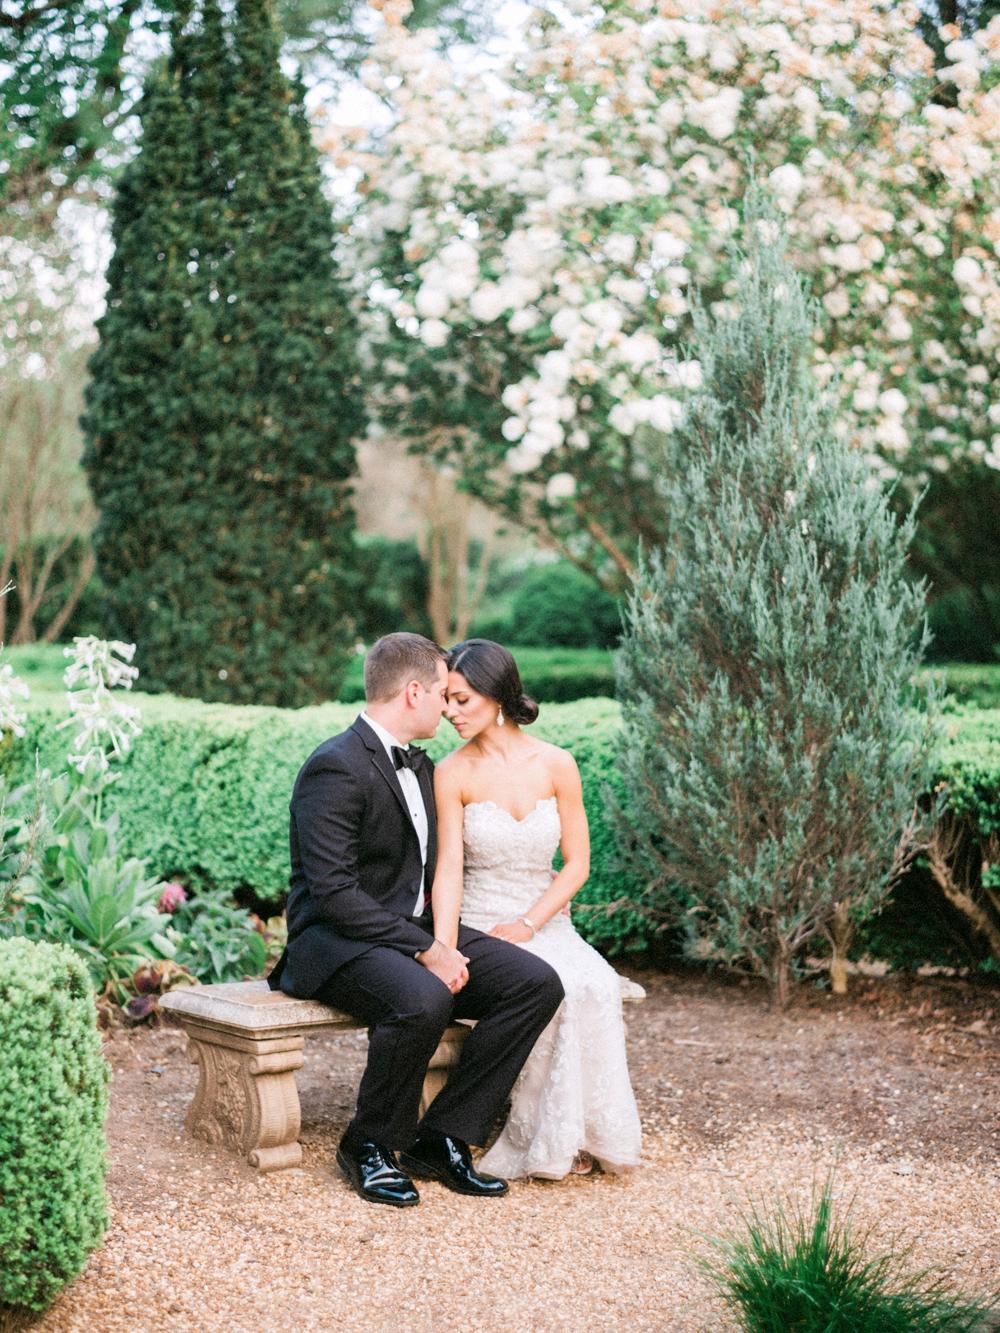 Barnsley Planation Wedding. Georgia Wedding Photographer_0029.jpg